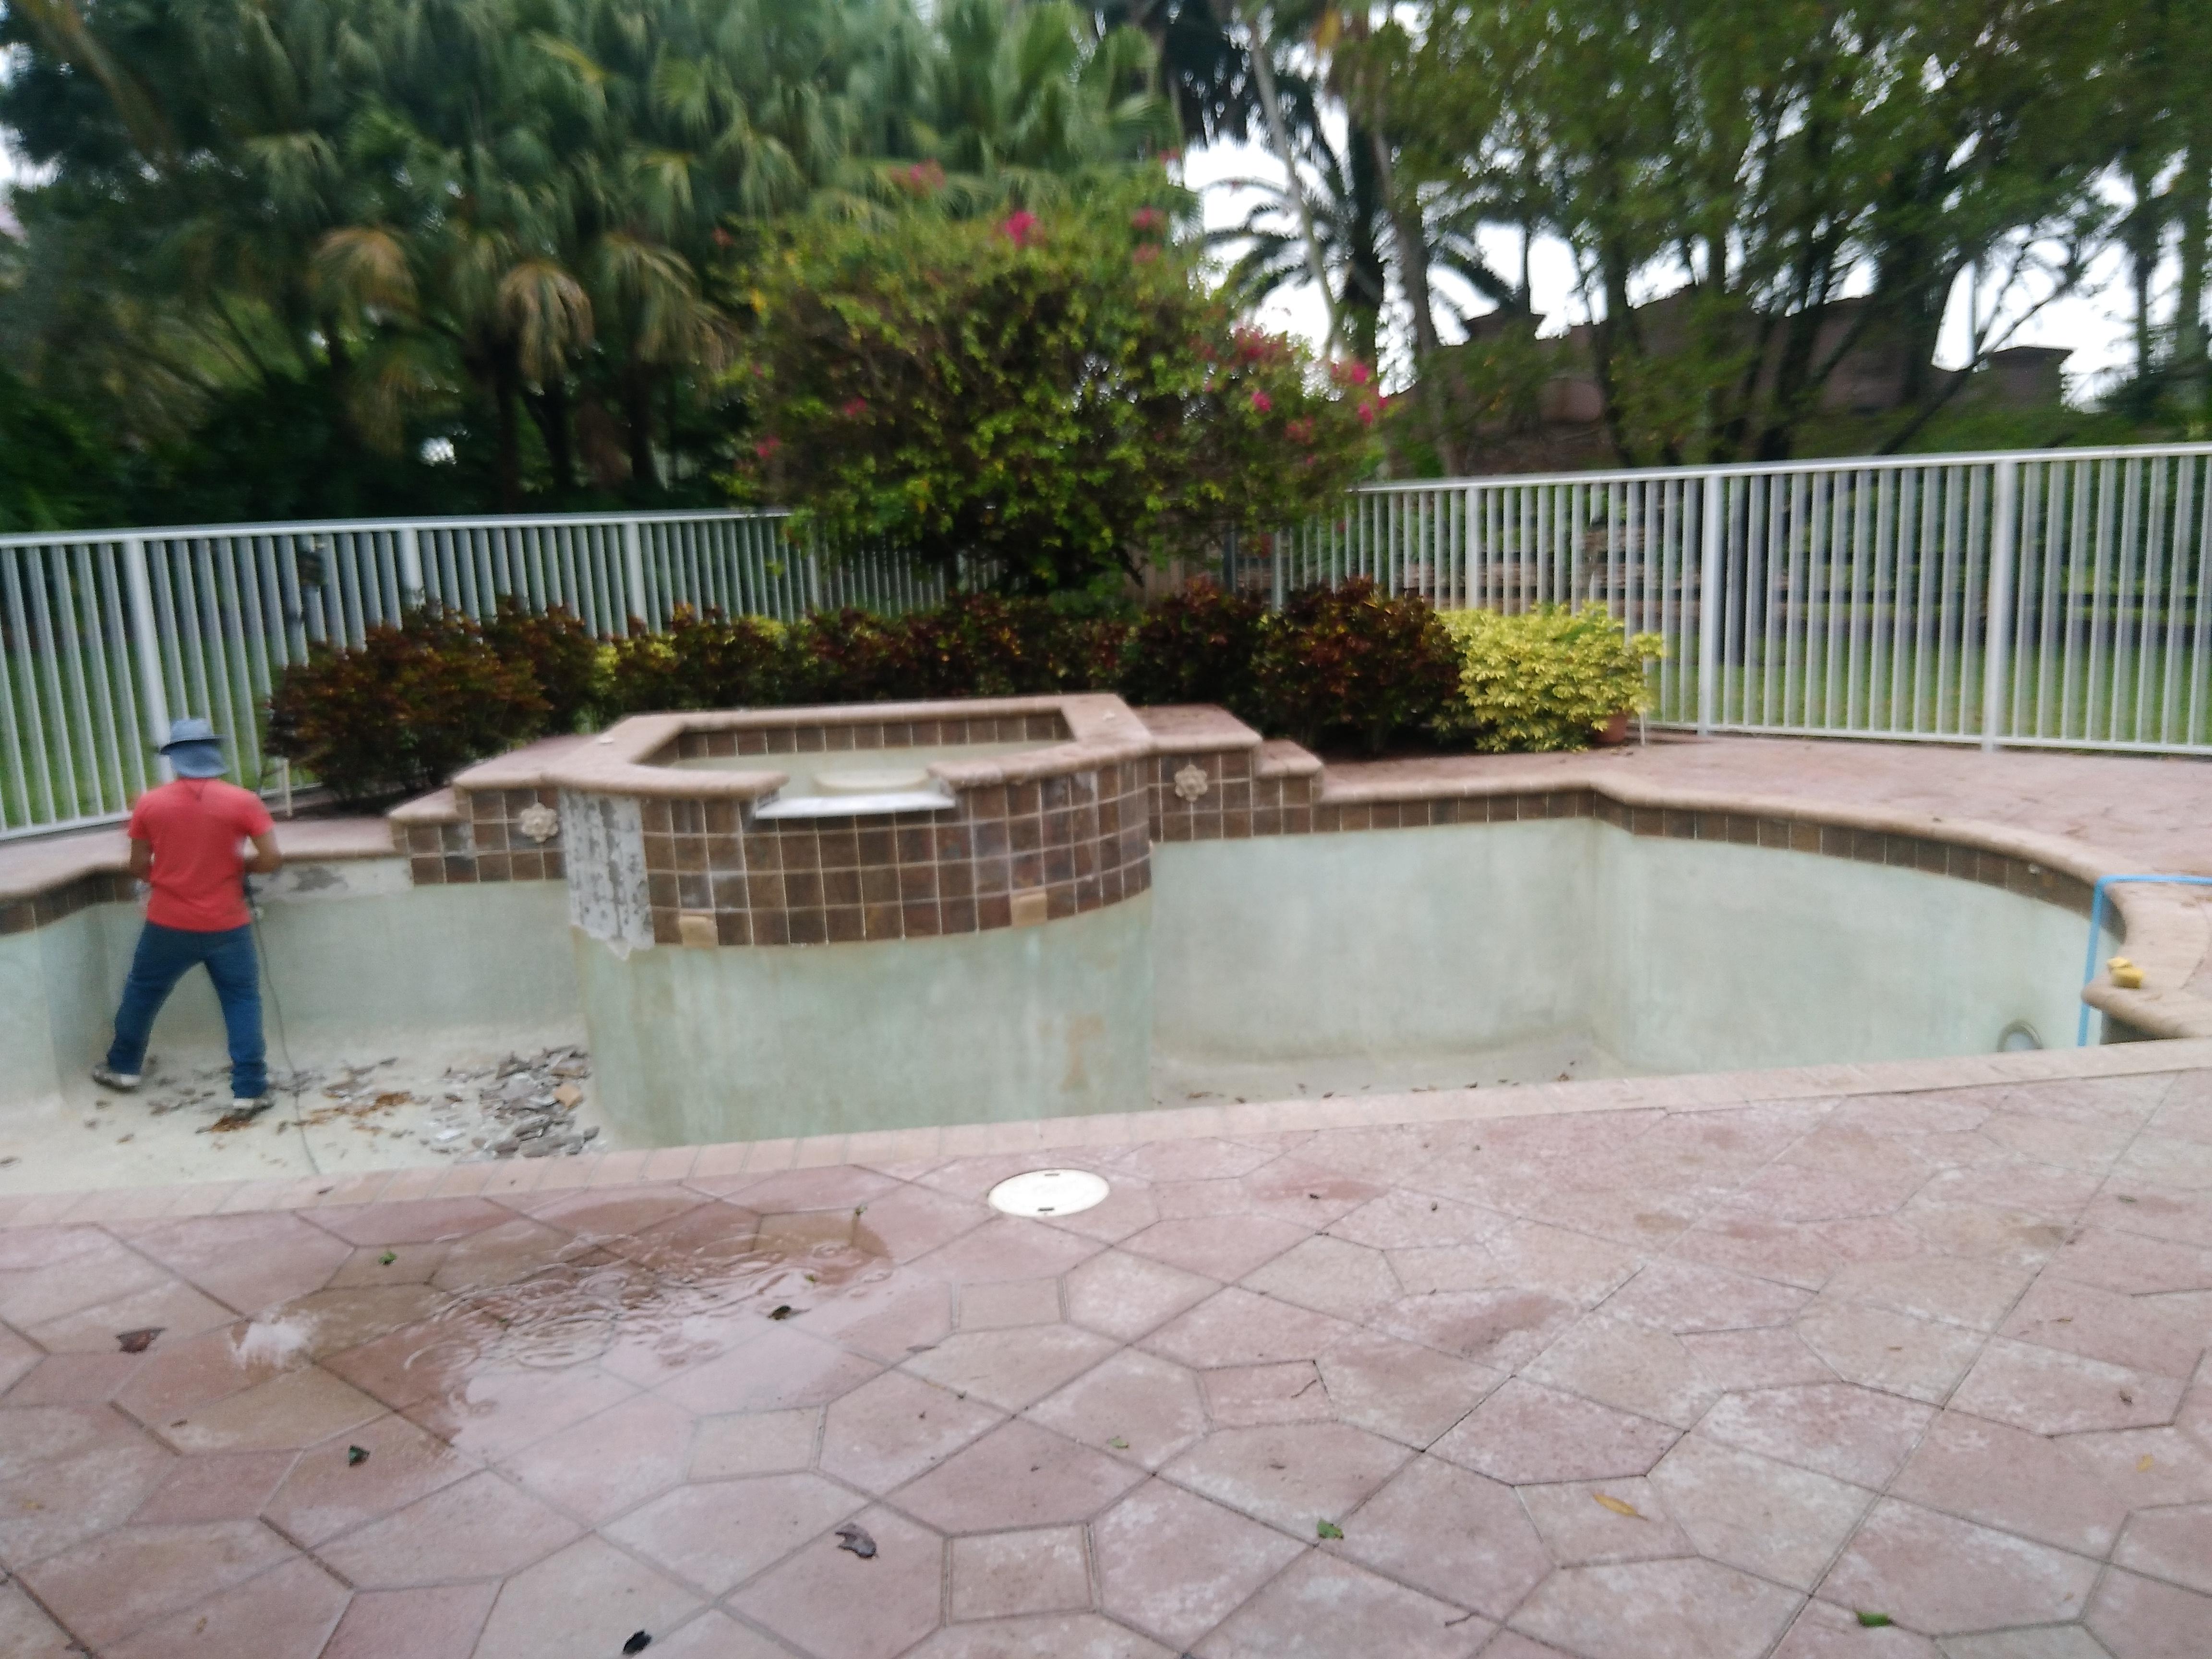 villa pavers and pools, small swimming pool, pool companies near me, backyard pool, pool builders, p